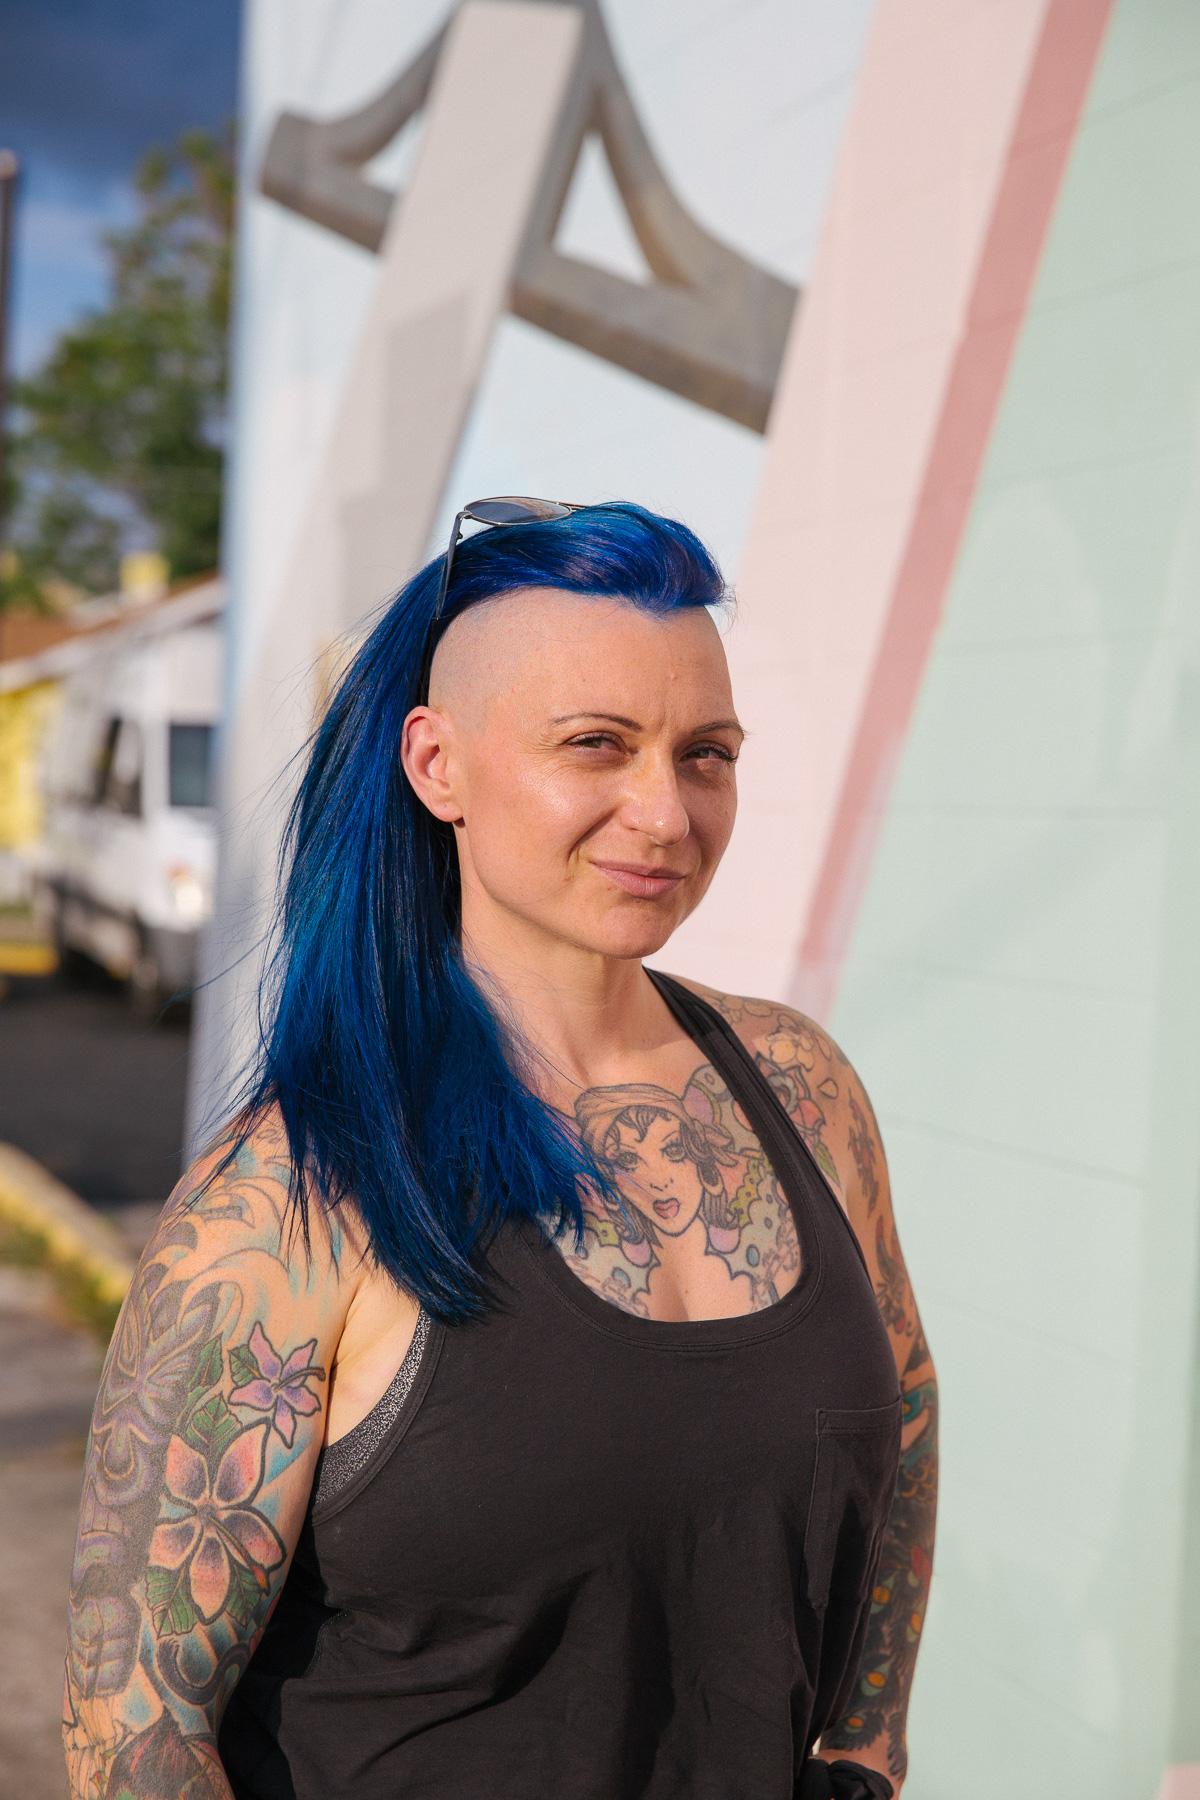 Celine Duvoisin, owner of Valhalla Bakery. photo credit  @lemonhearted